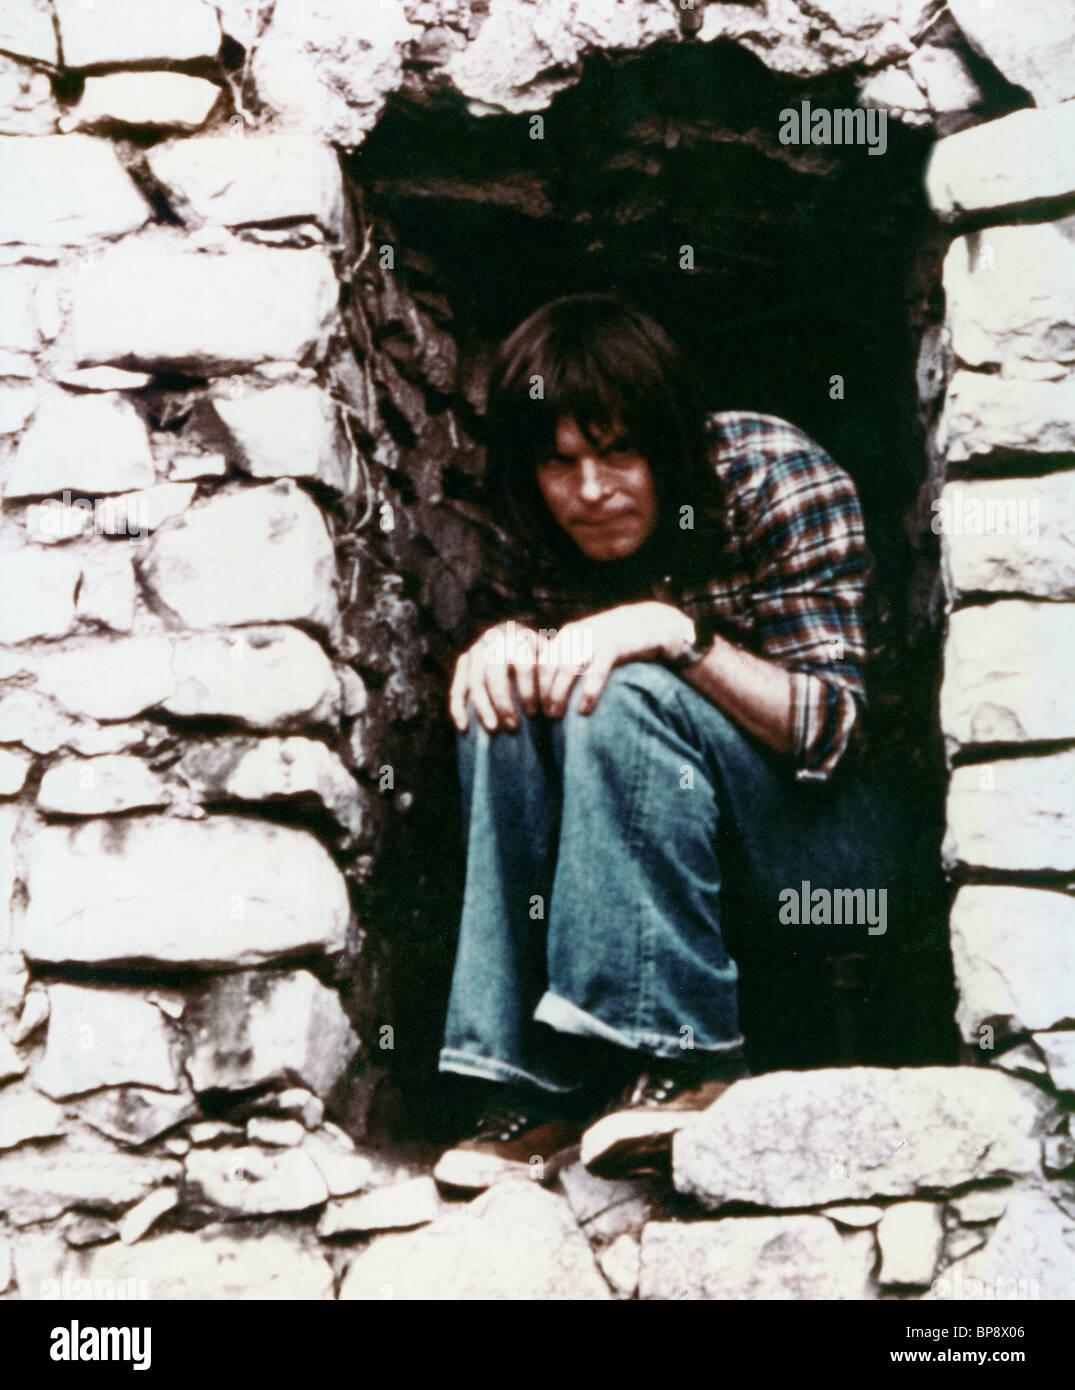 TERRY GILLIAM JABBERWOCKY (1977) - Stock Image